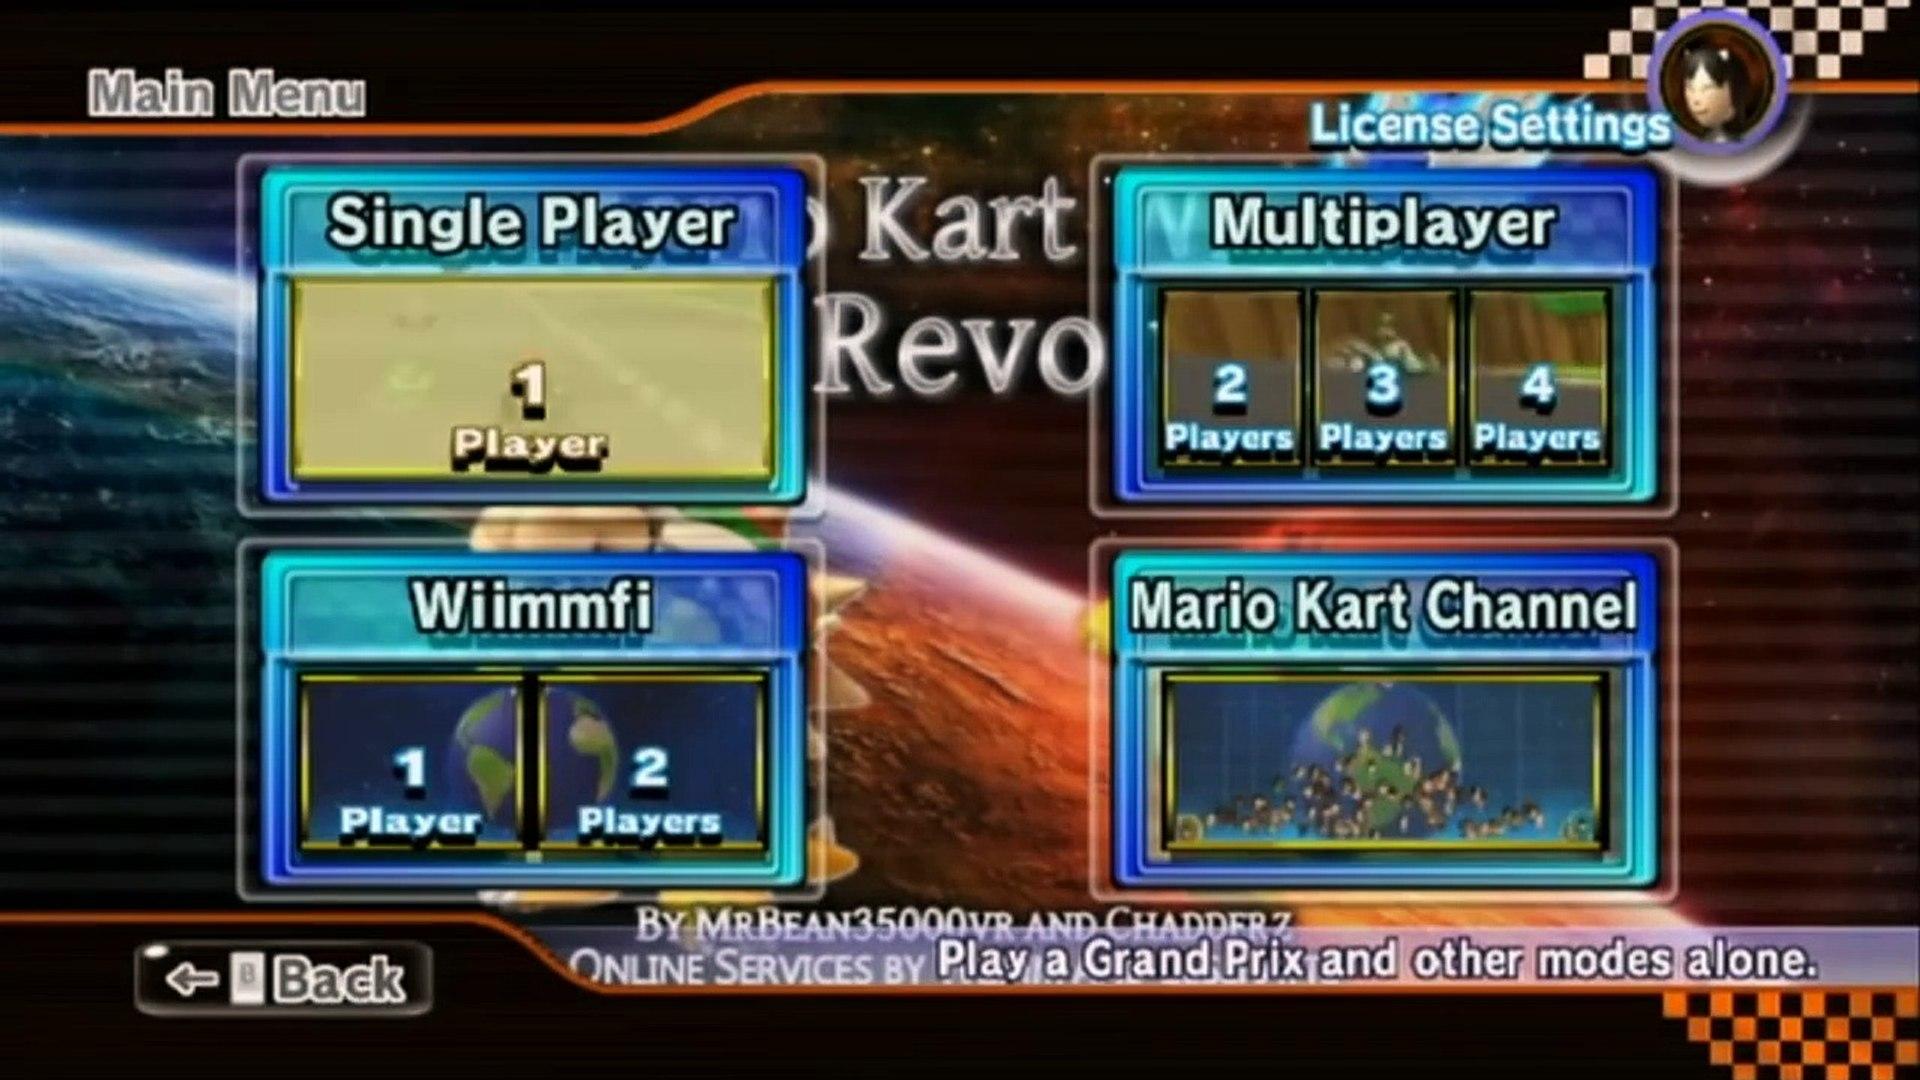 Mario Kart Wii Custom Tracks Reloaded Mega Mushroom Cup Hd